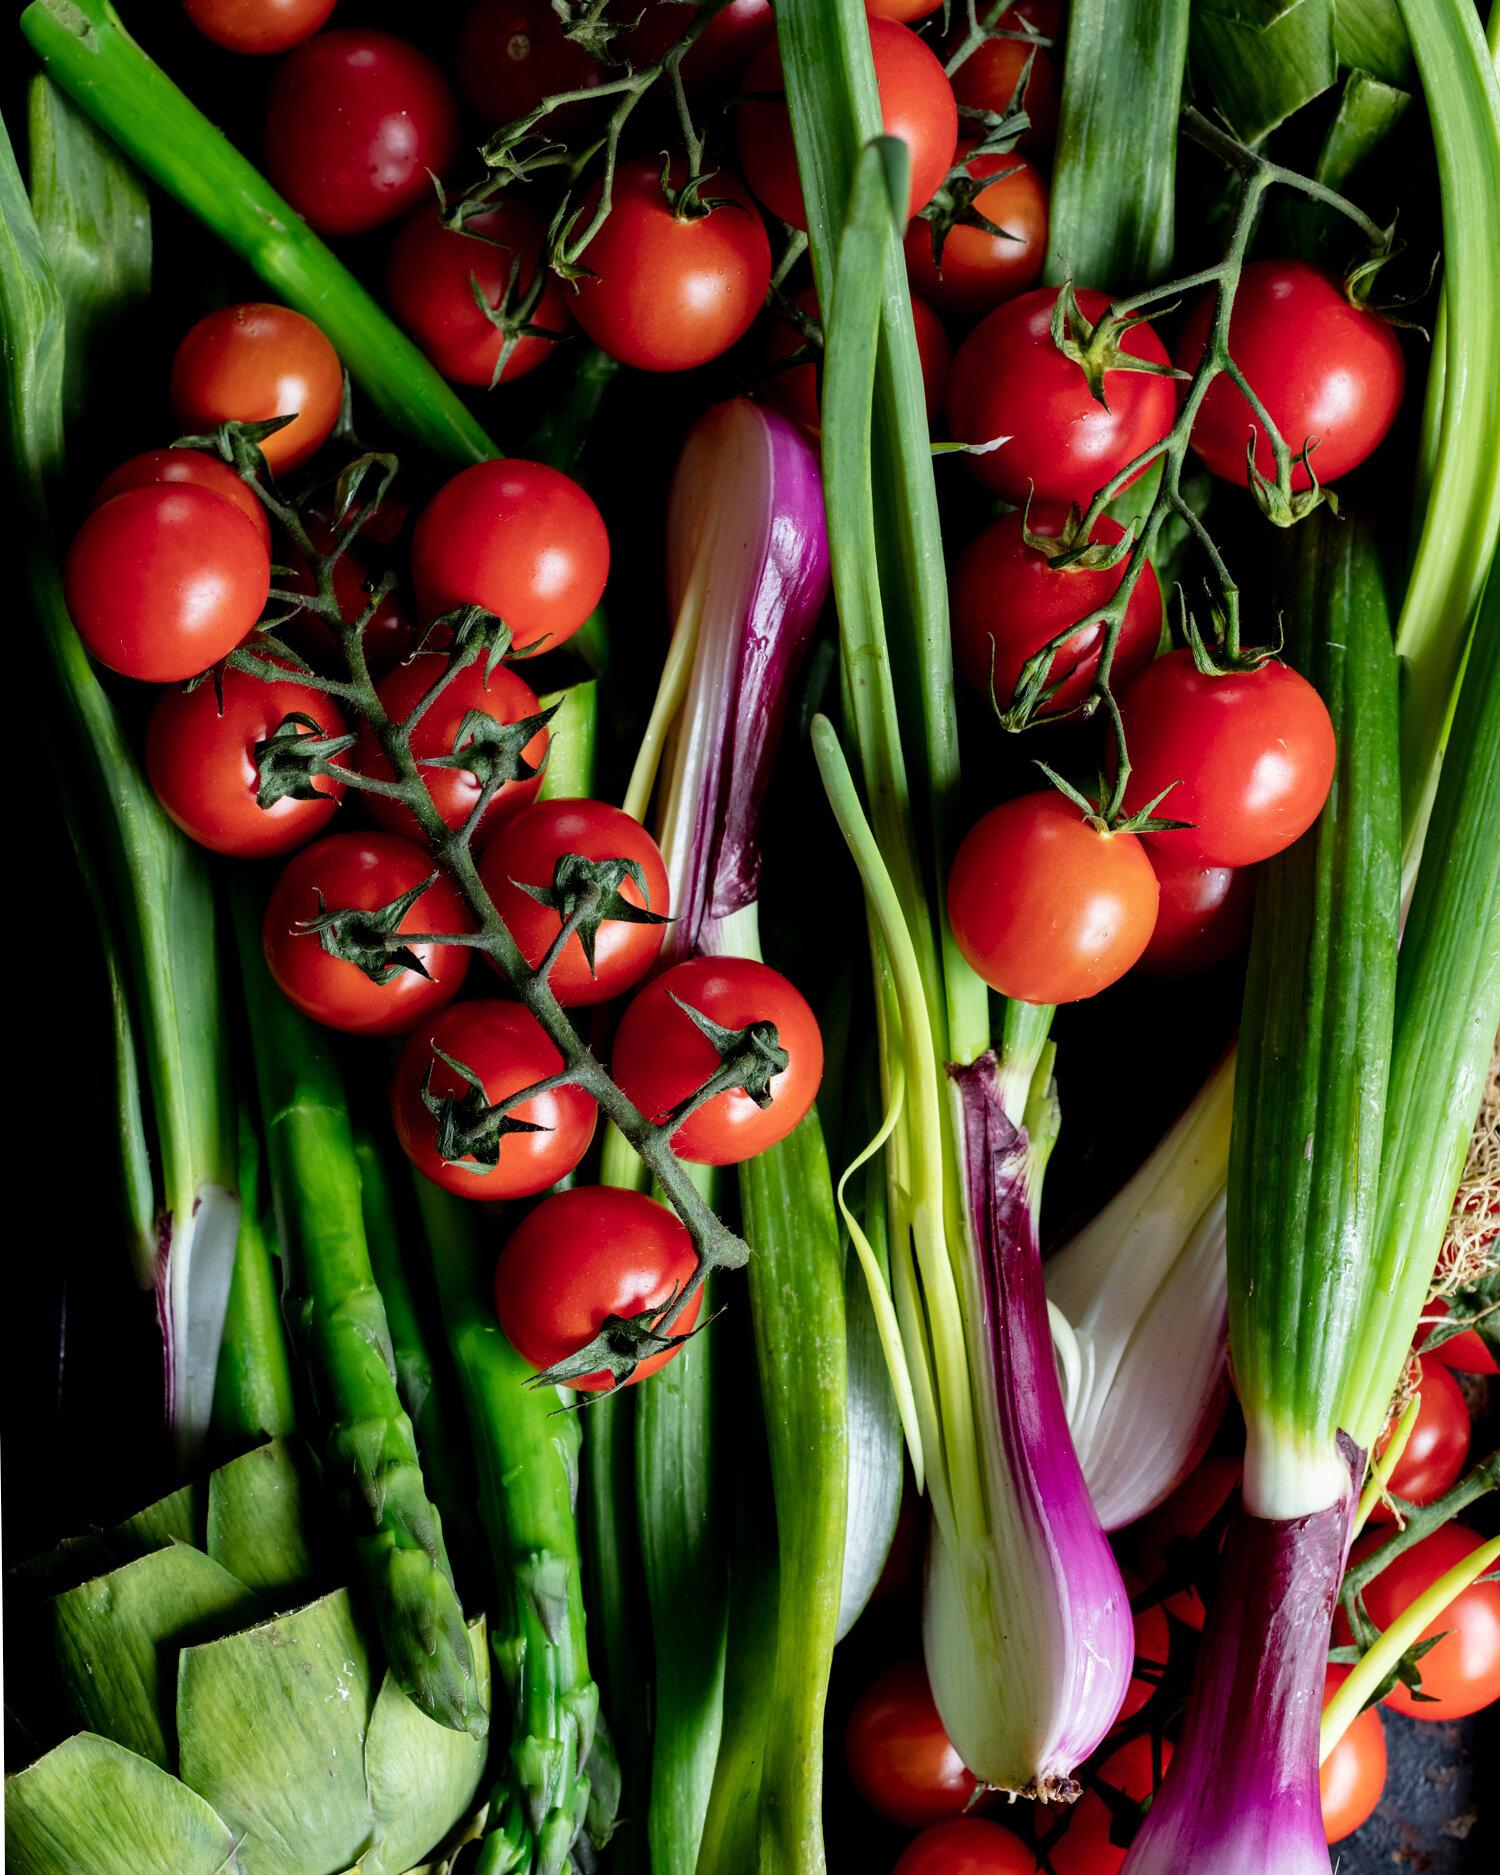 erin-scott_san-francisco-california-food-photographer-natural-light-editorial-raw-veggies-dark-georgedolese_may2019-1812.jpg